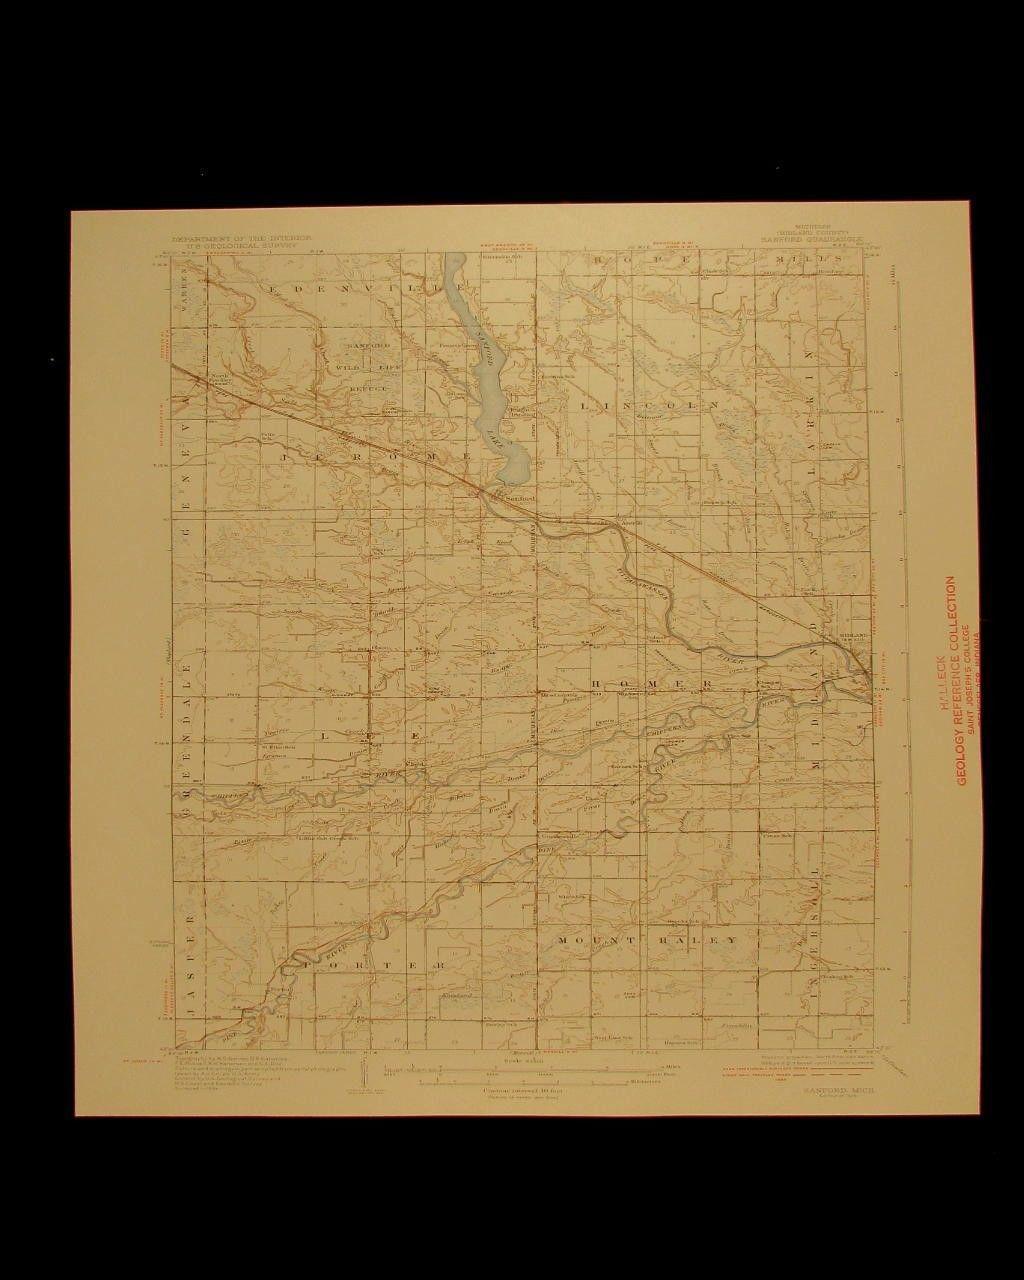 Sanford Michigan Vintage 1936 Original USGS Topographical